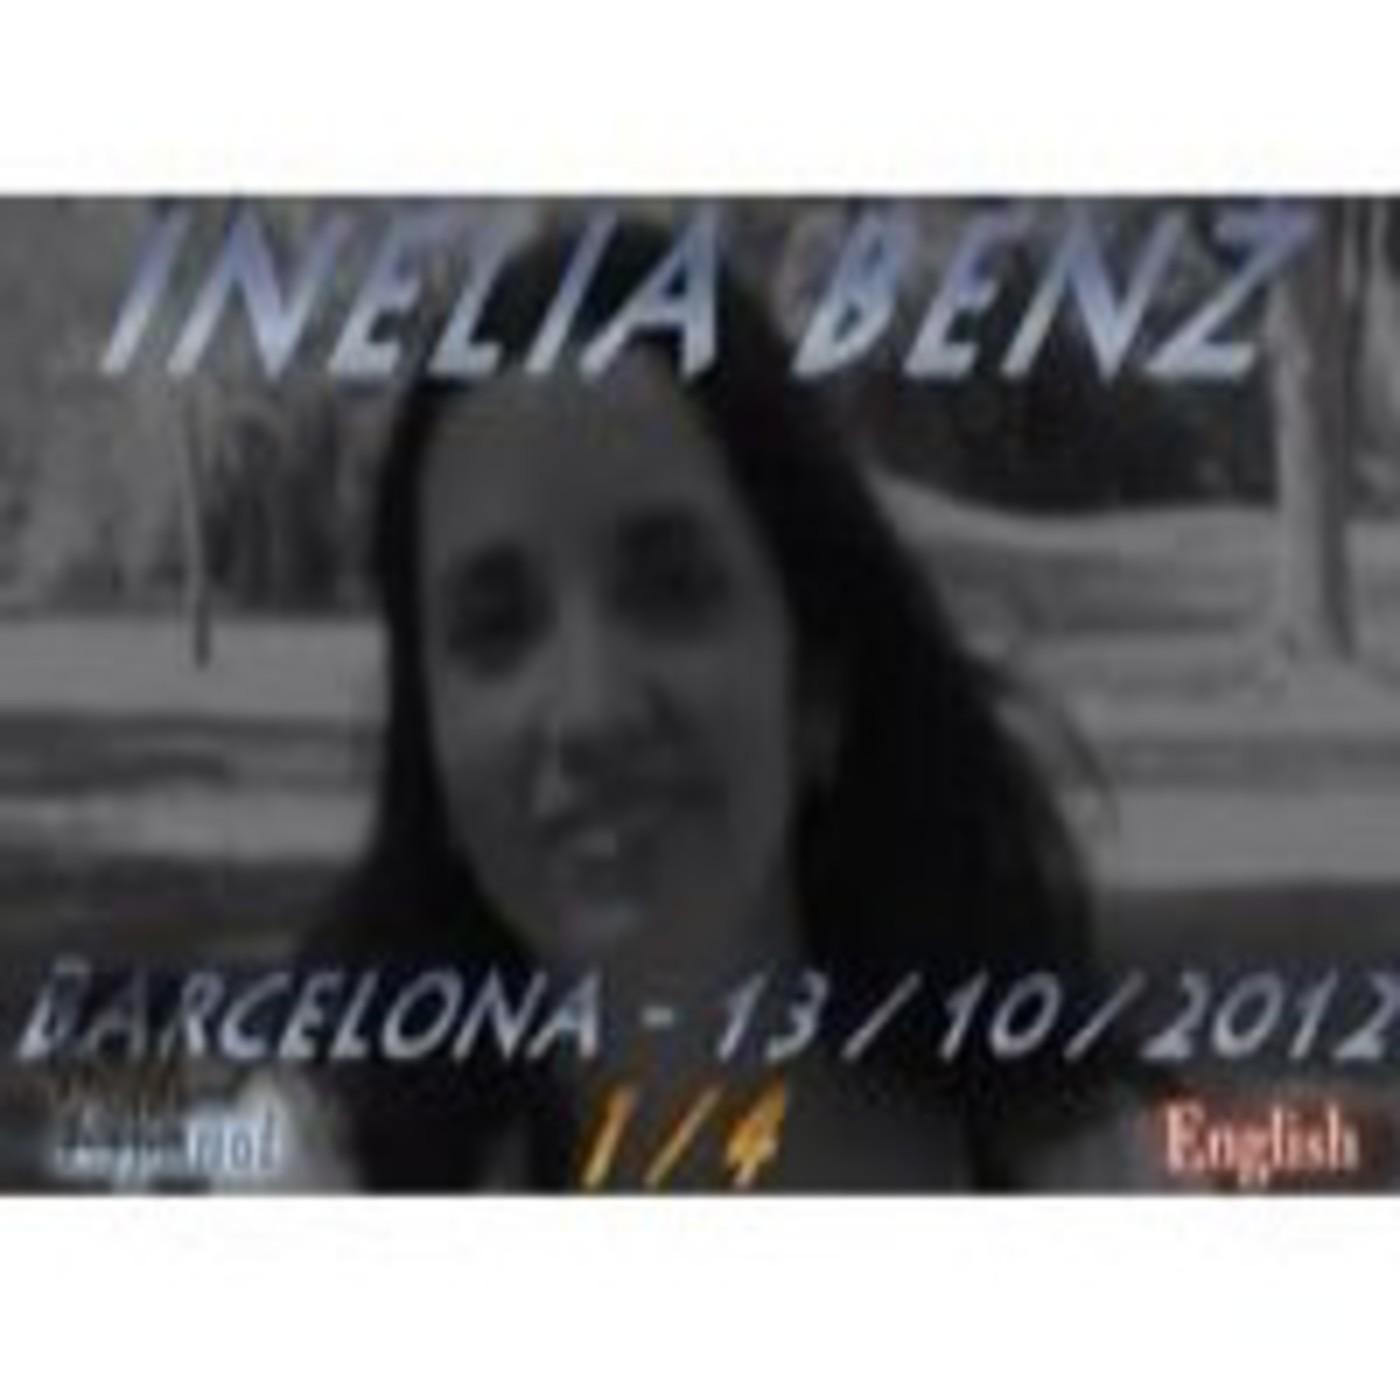 Inelia Benz 1/4 - Nuevo sistema operativo para el ser humano / New Operating system for humans